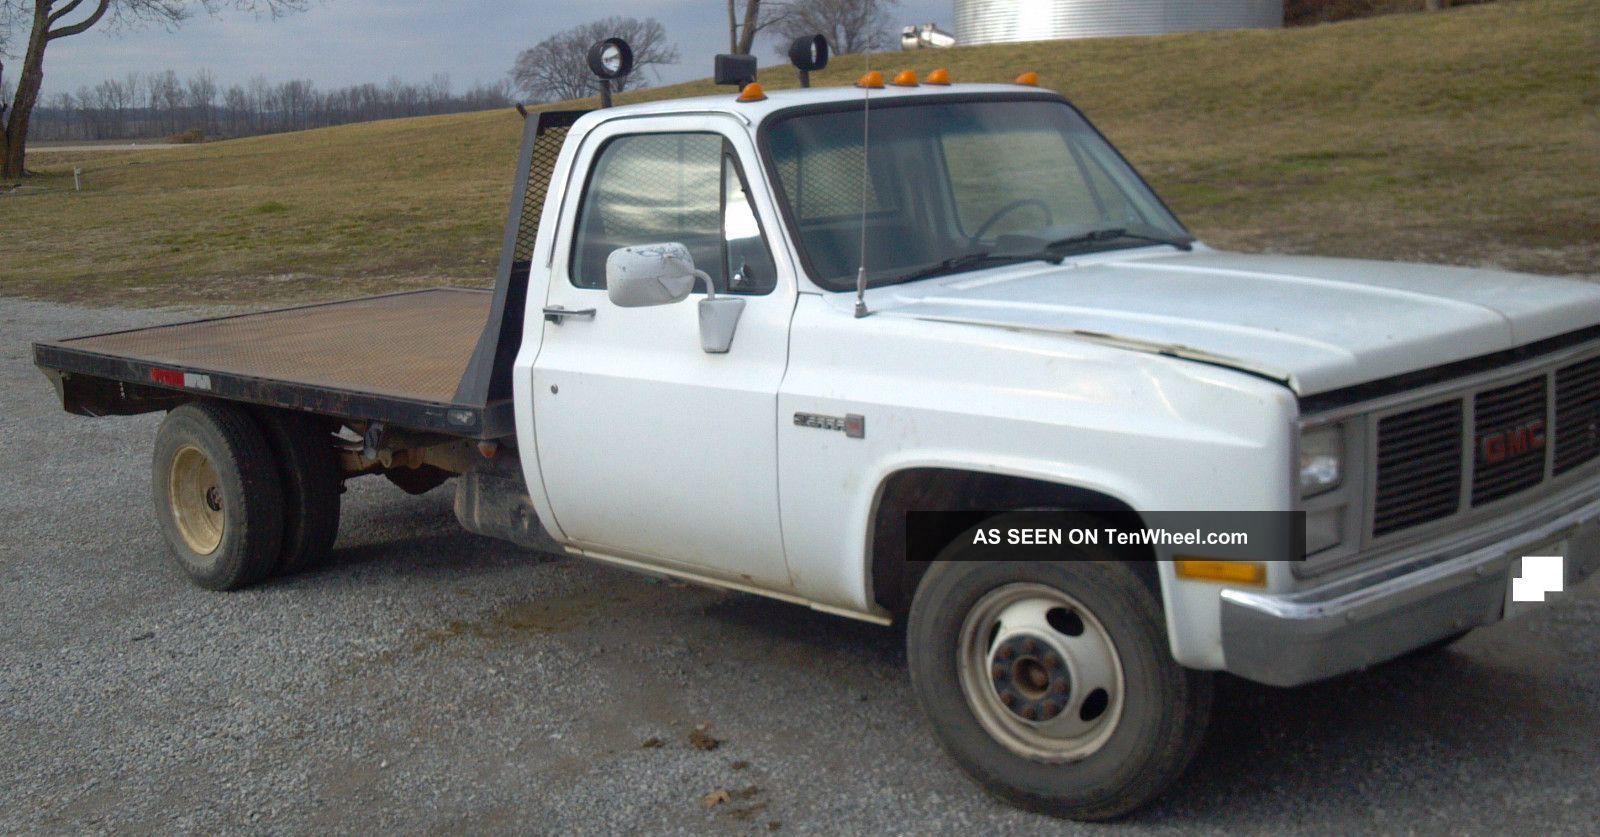 used 1 ton flatbed trucks for sale yakaz autos weblog. Black Bedroom Furniture Sets. Home Design Ideas